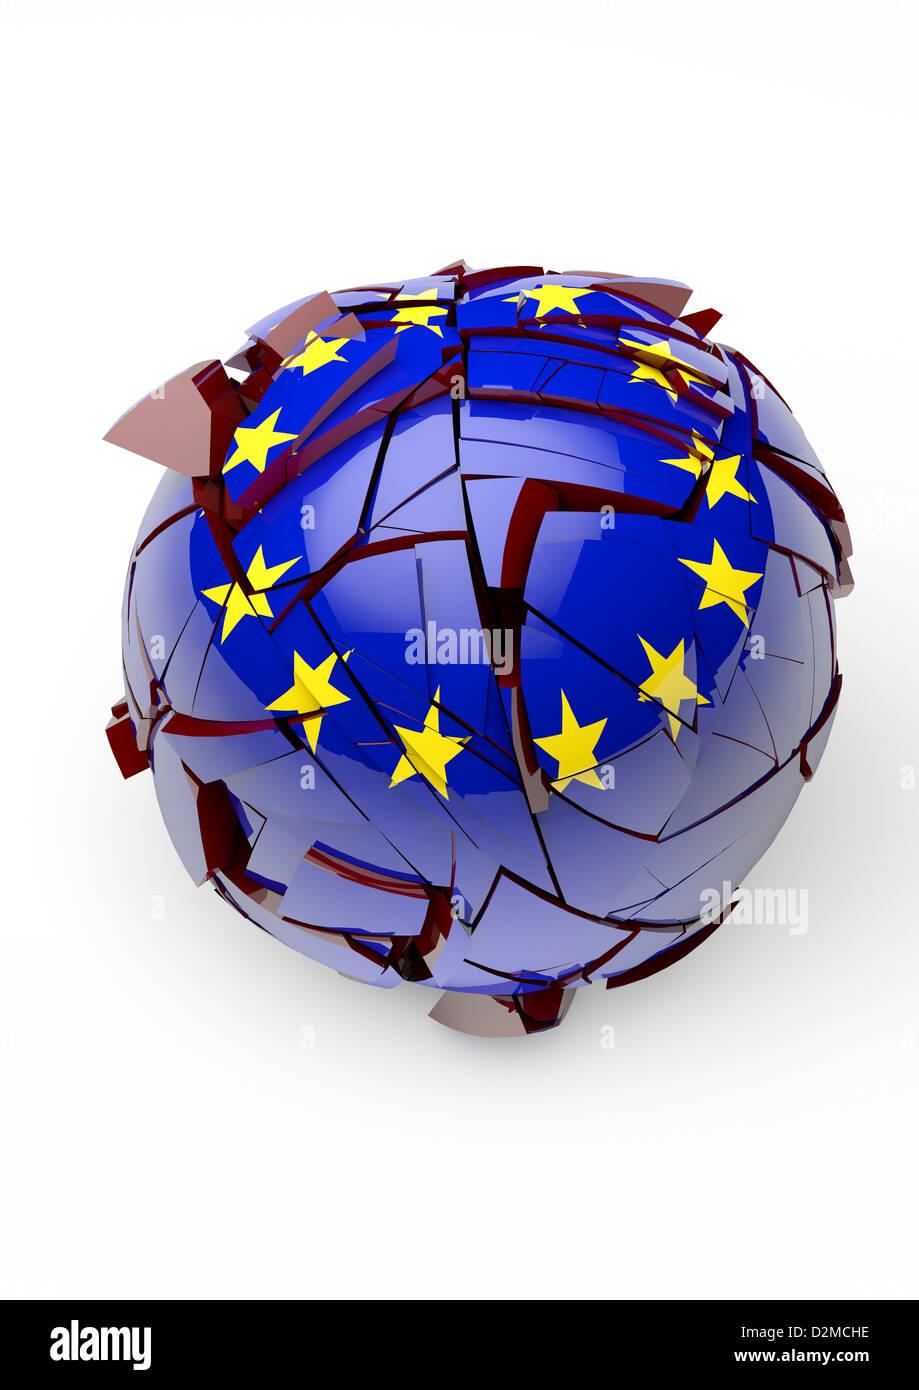 EU break up concept - white background - Stock Image